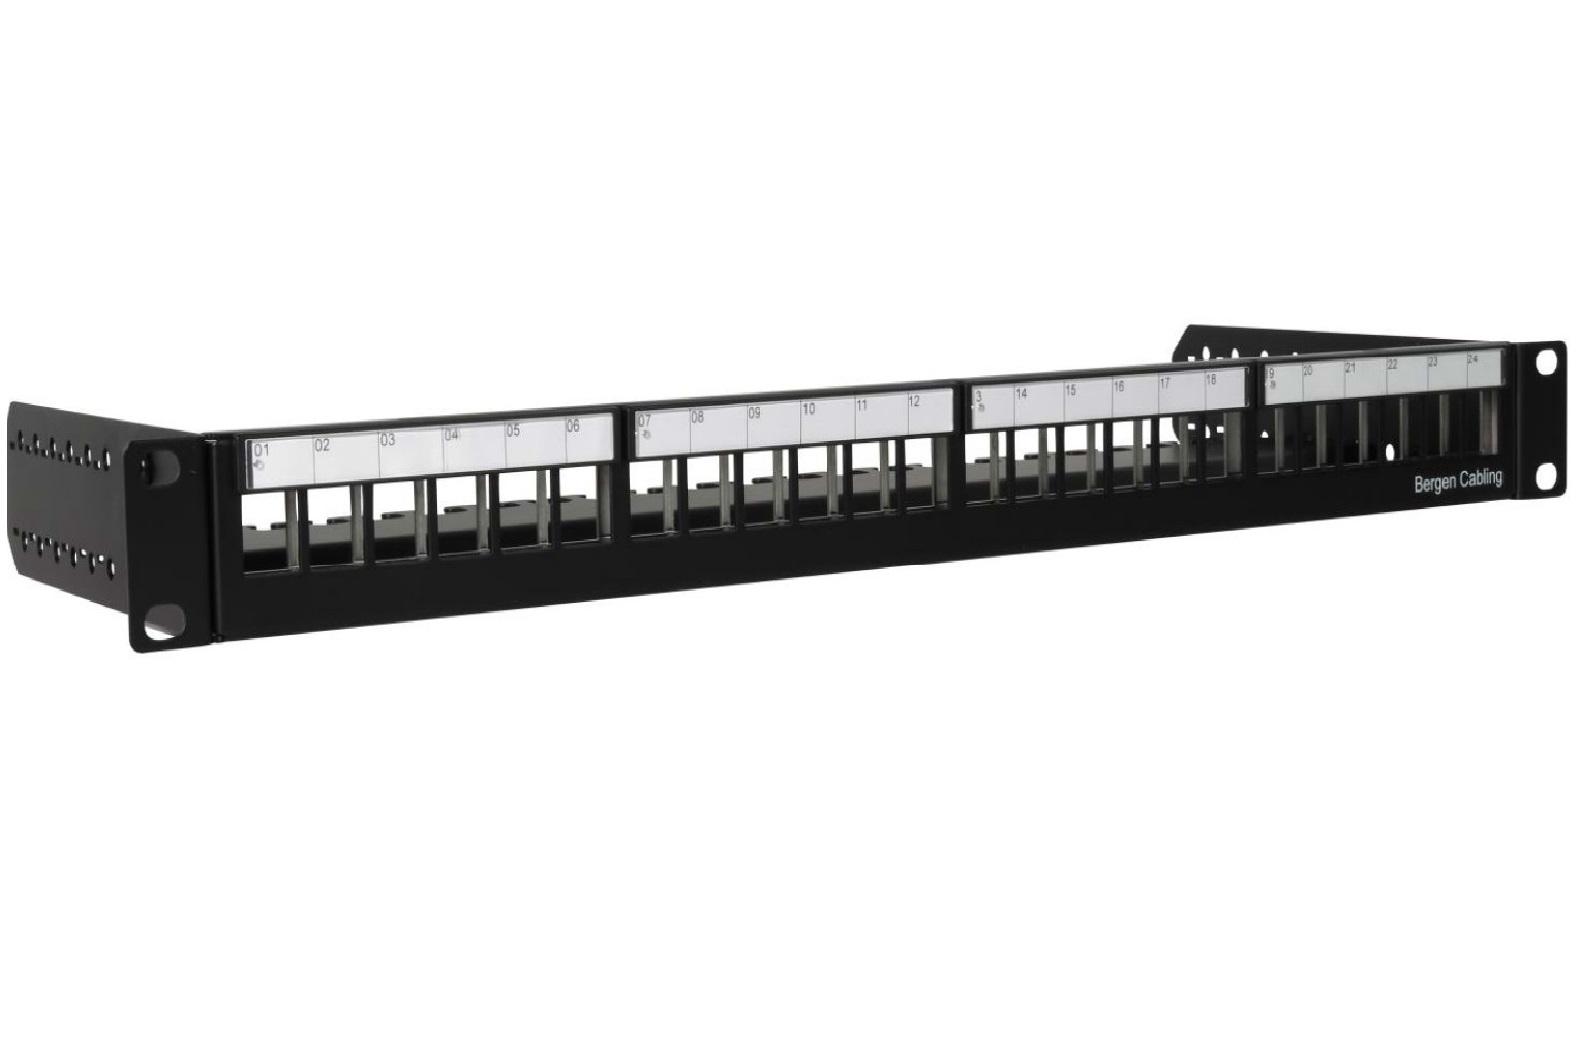 Bergen Cabling - Maritime LAN PP 24p Black - Empty v2